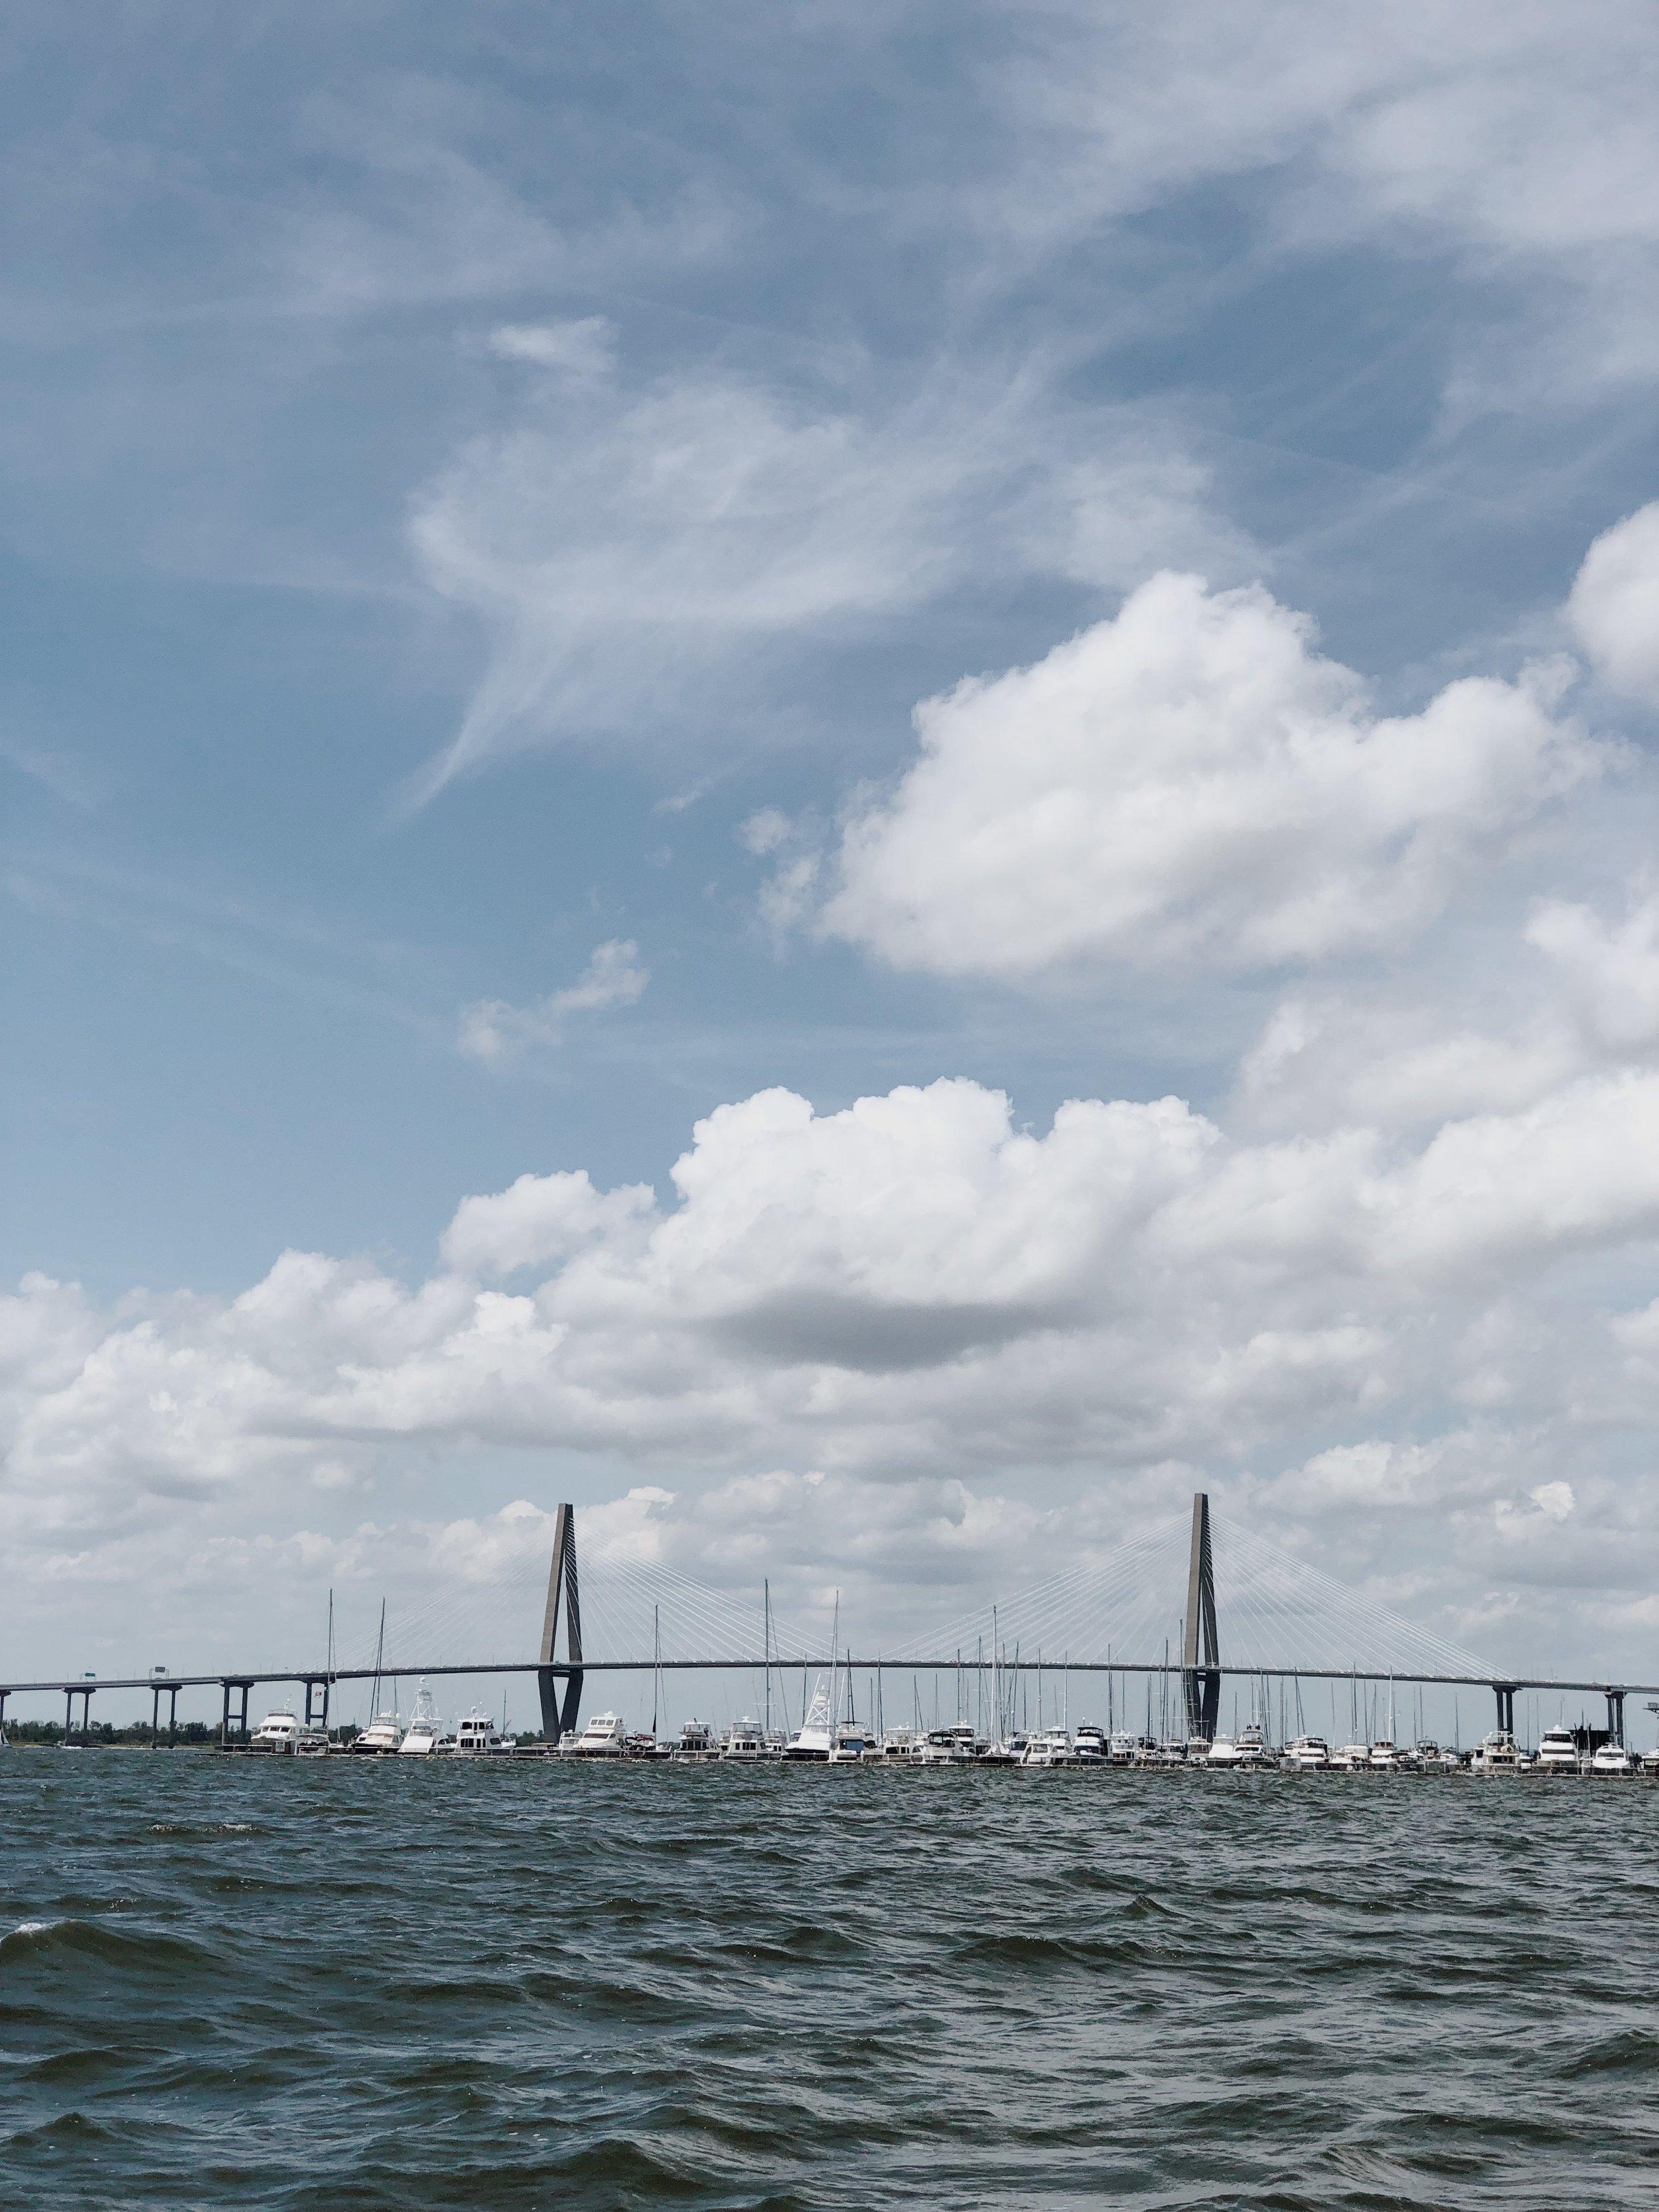 Arthur Ravenel Jr. Bridge view from the boat